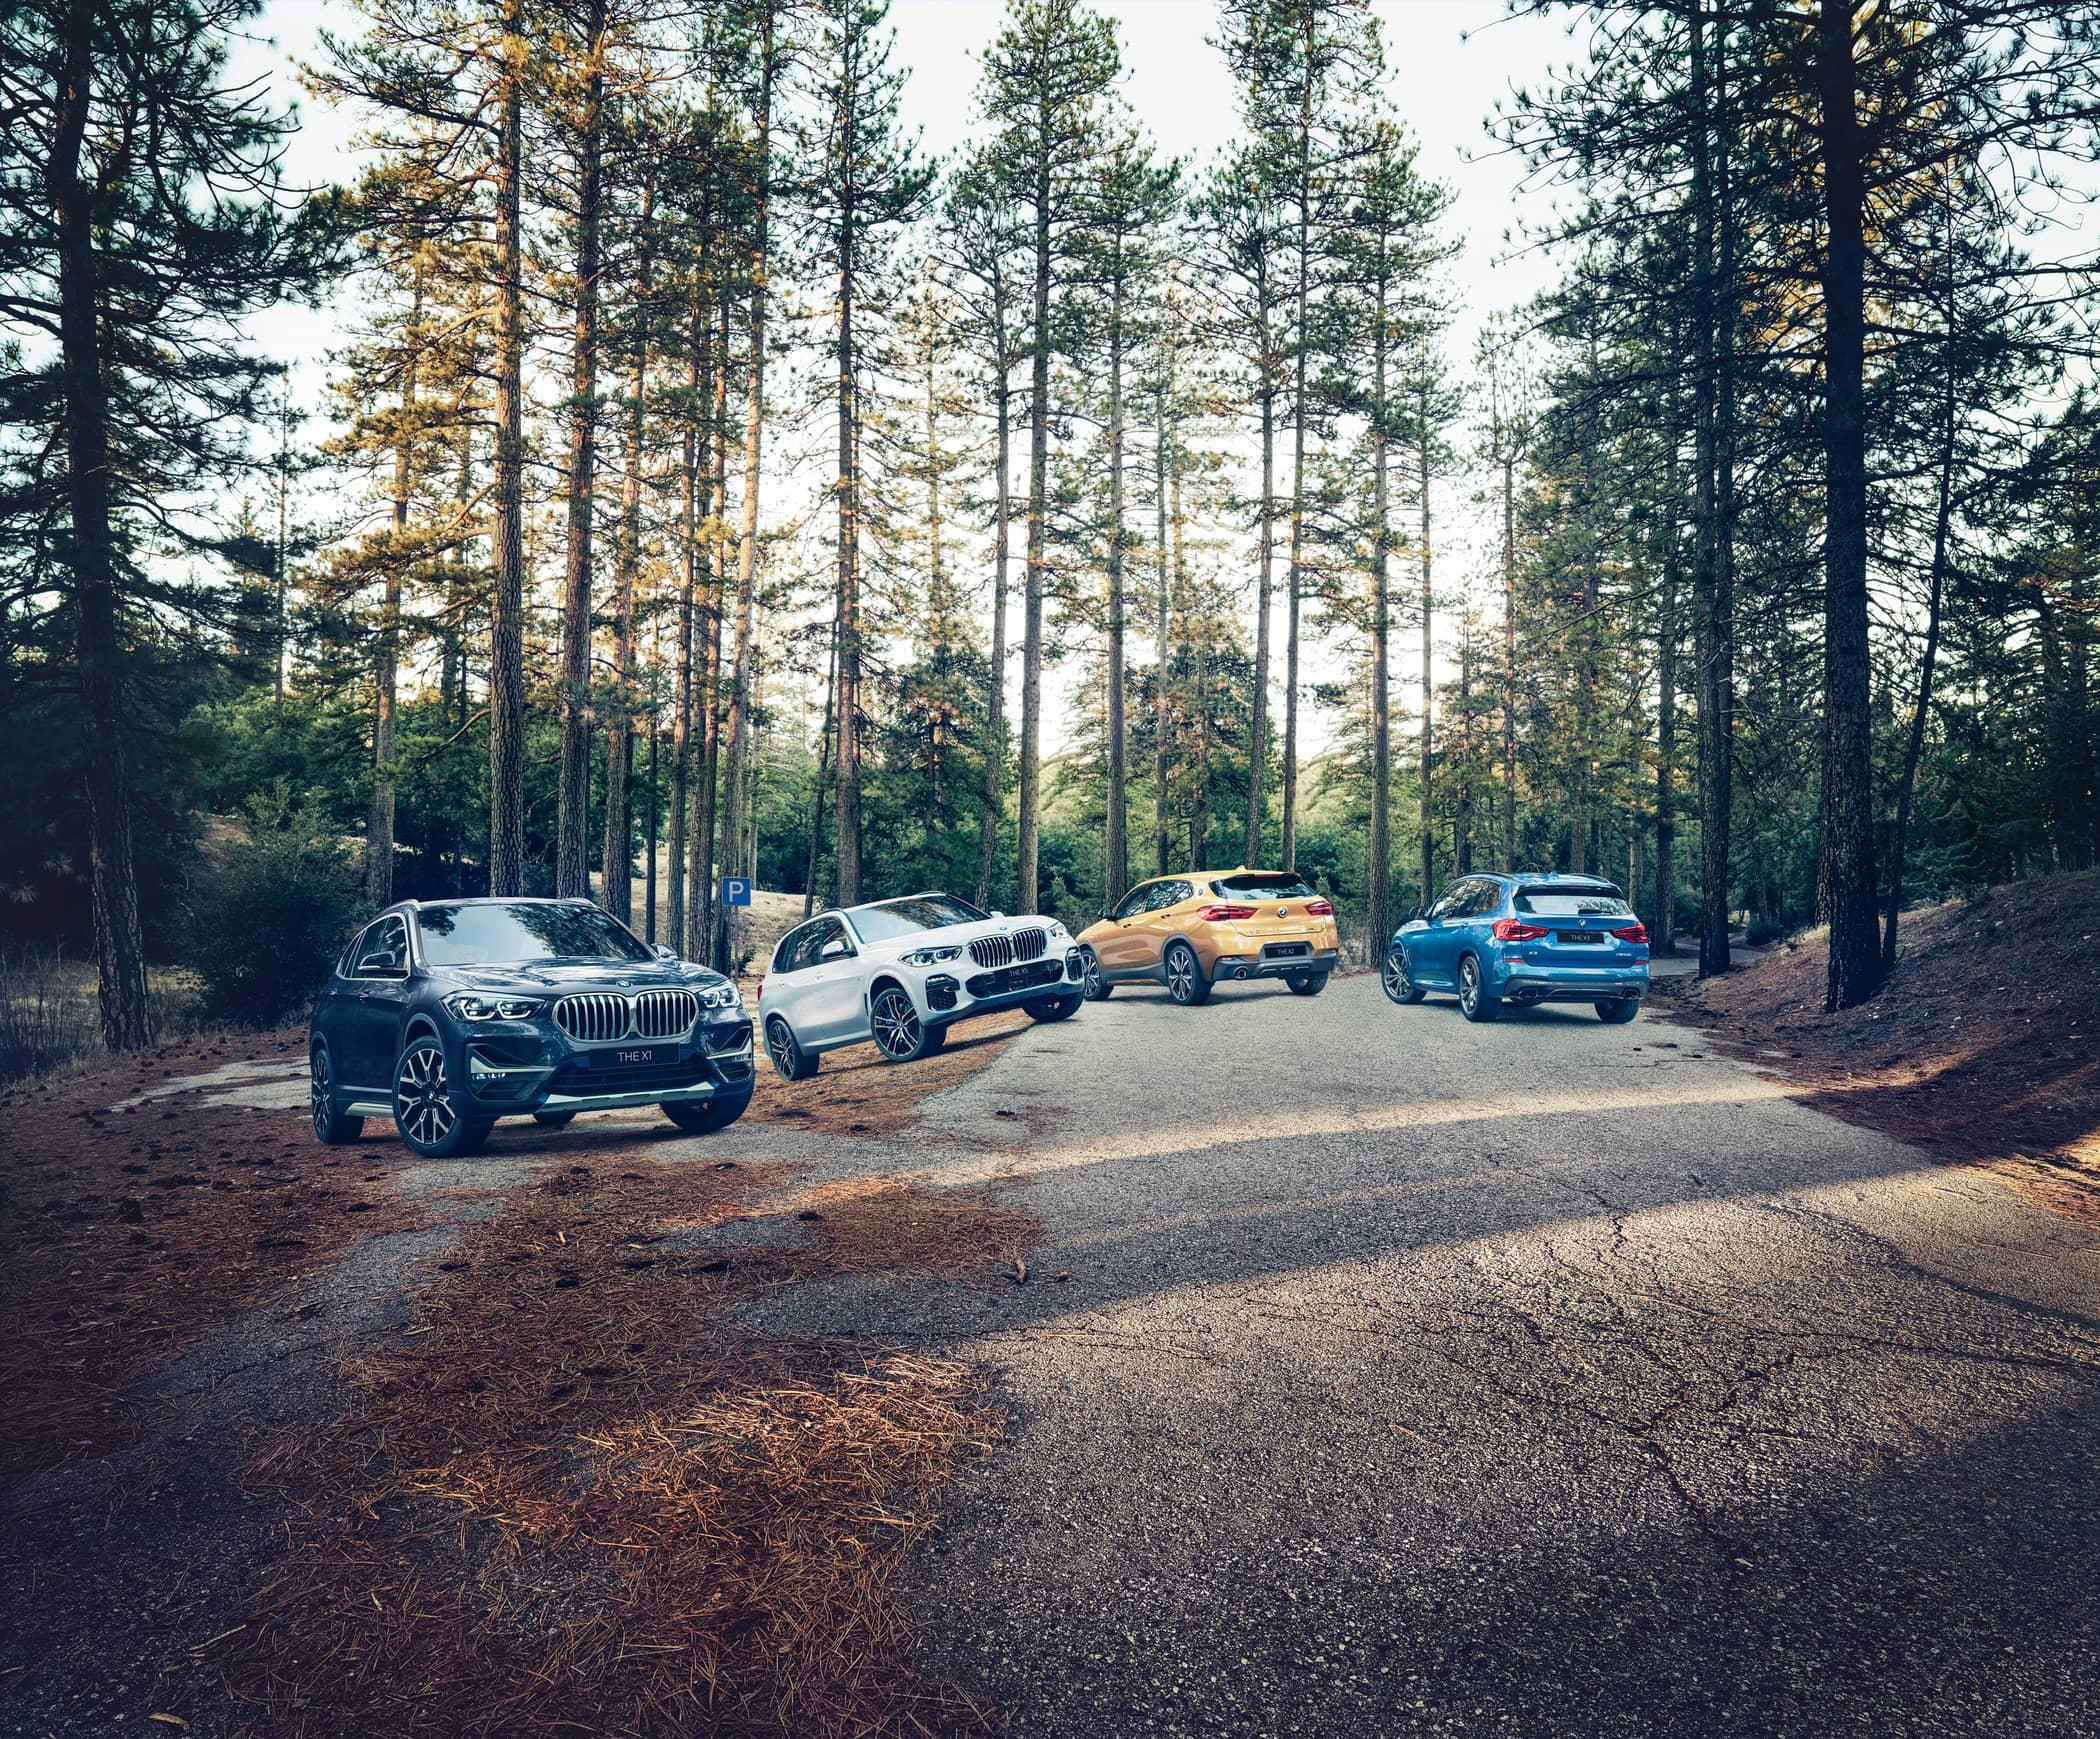 BMW-X1-F48-LCI,-BMW-X3-G01,-BMW-X5-G05-CMYK-A0282436_bt_TheX1235-1.png